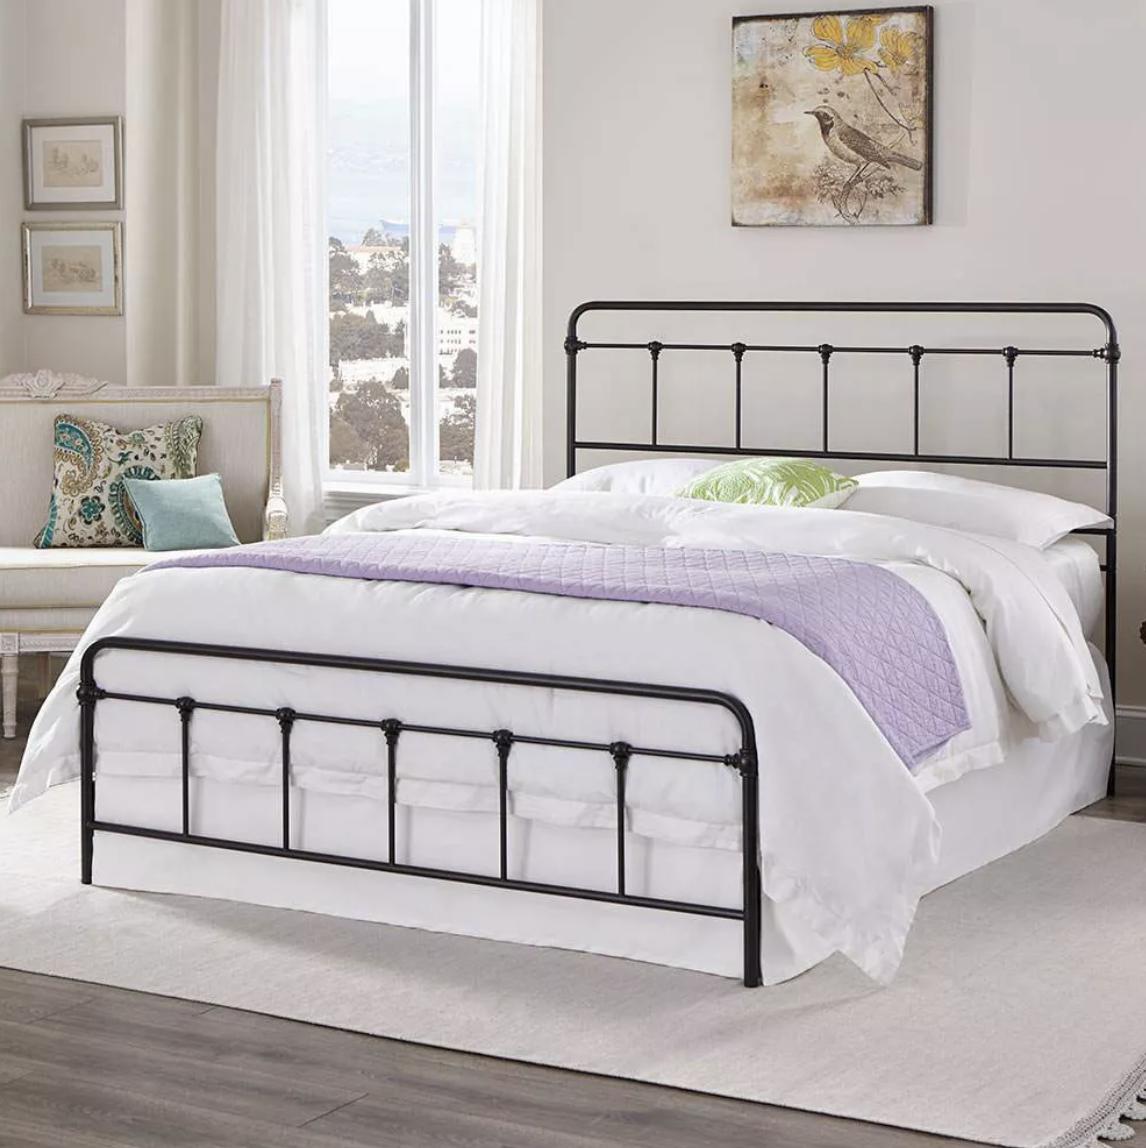 the black steel bedframe